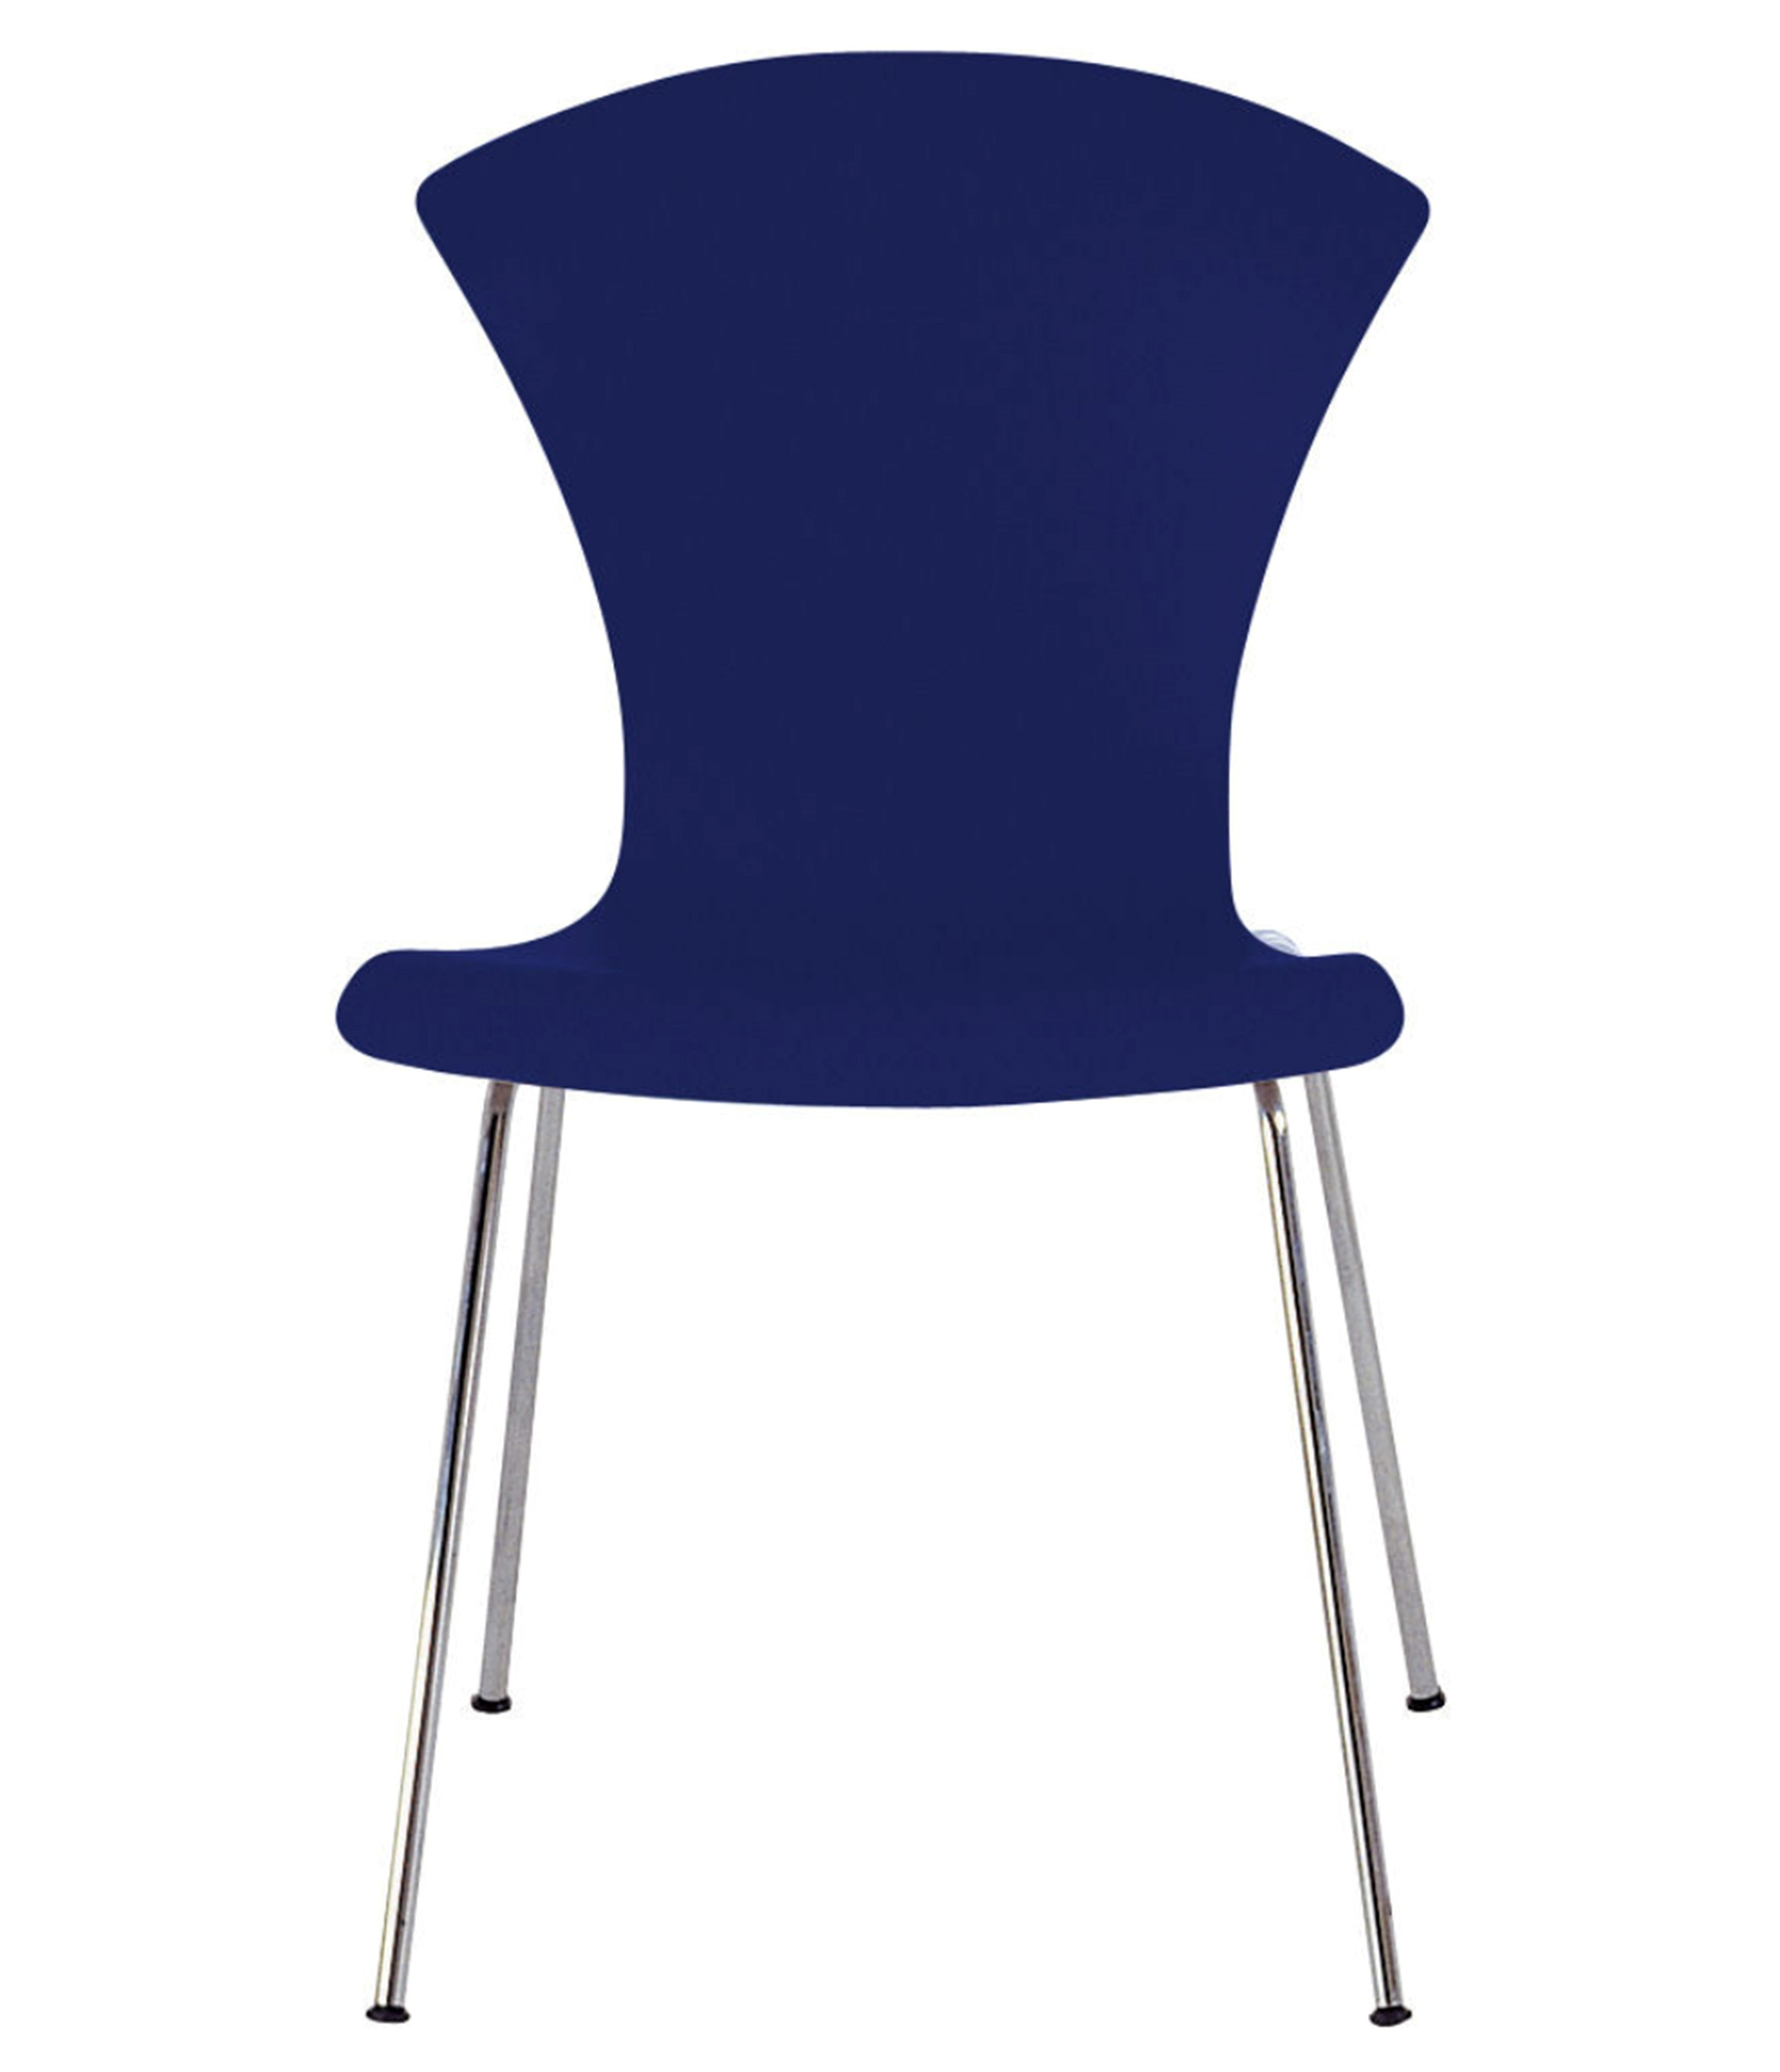 Sedie kartell scontate sedie a prezzi scontati for Sedie prezzi